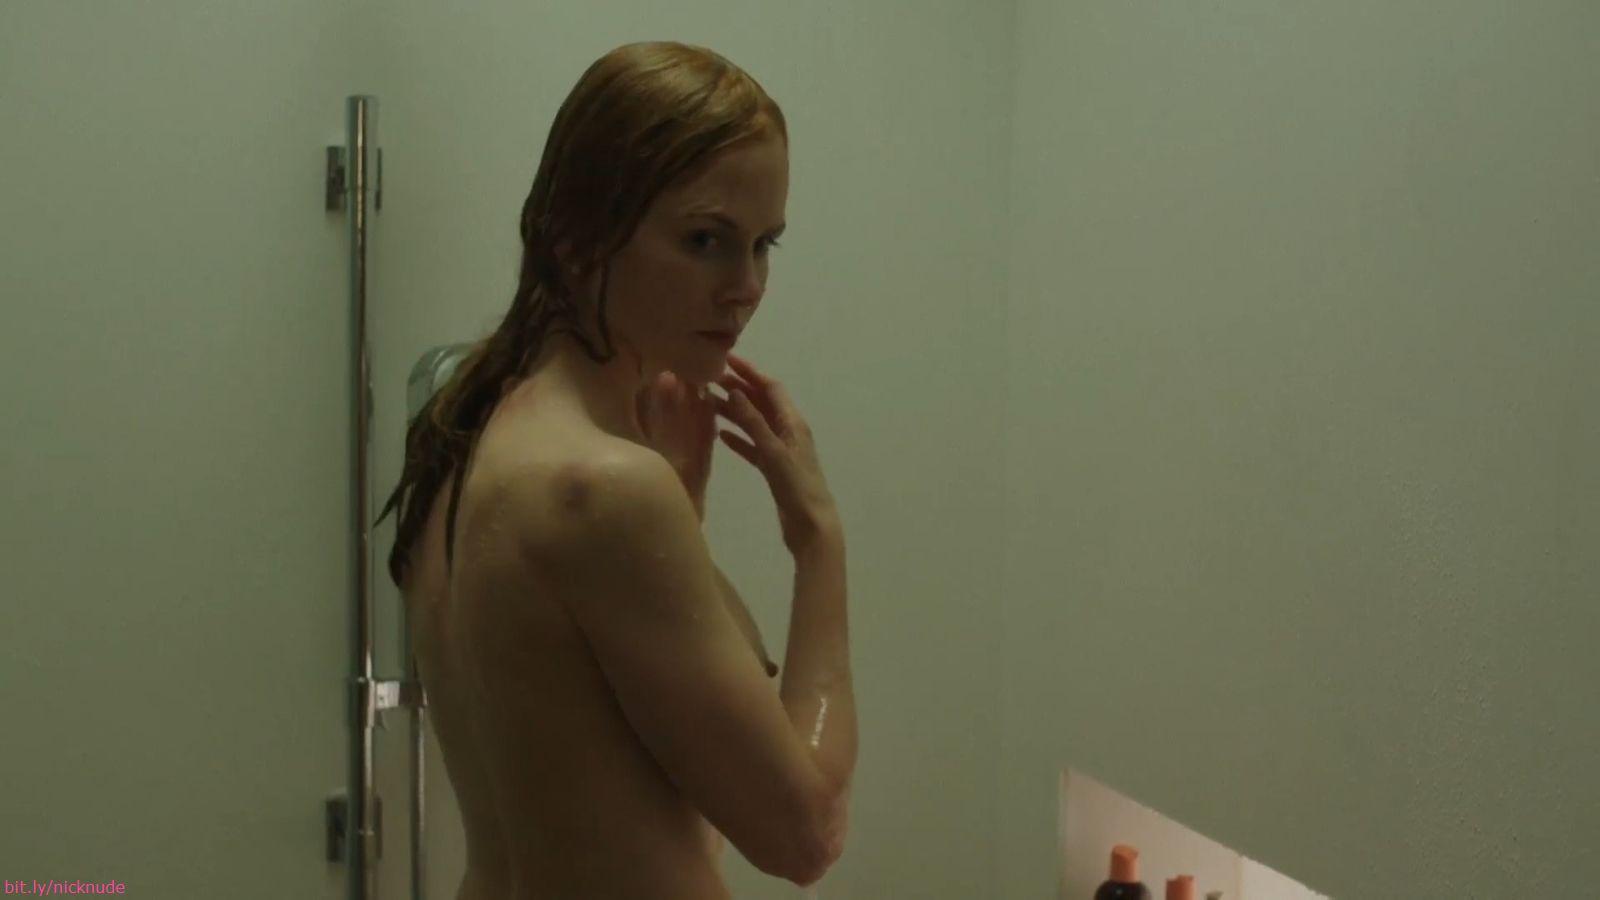 Nude Pics Of Nicole Kidman